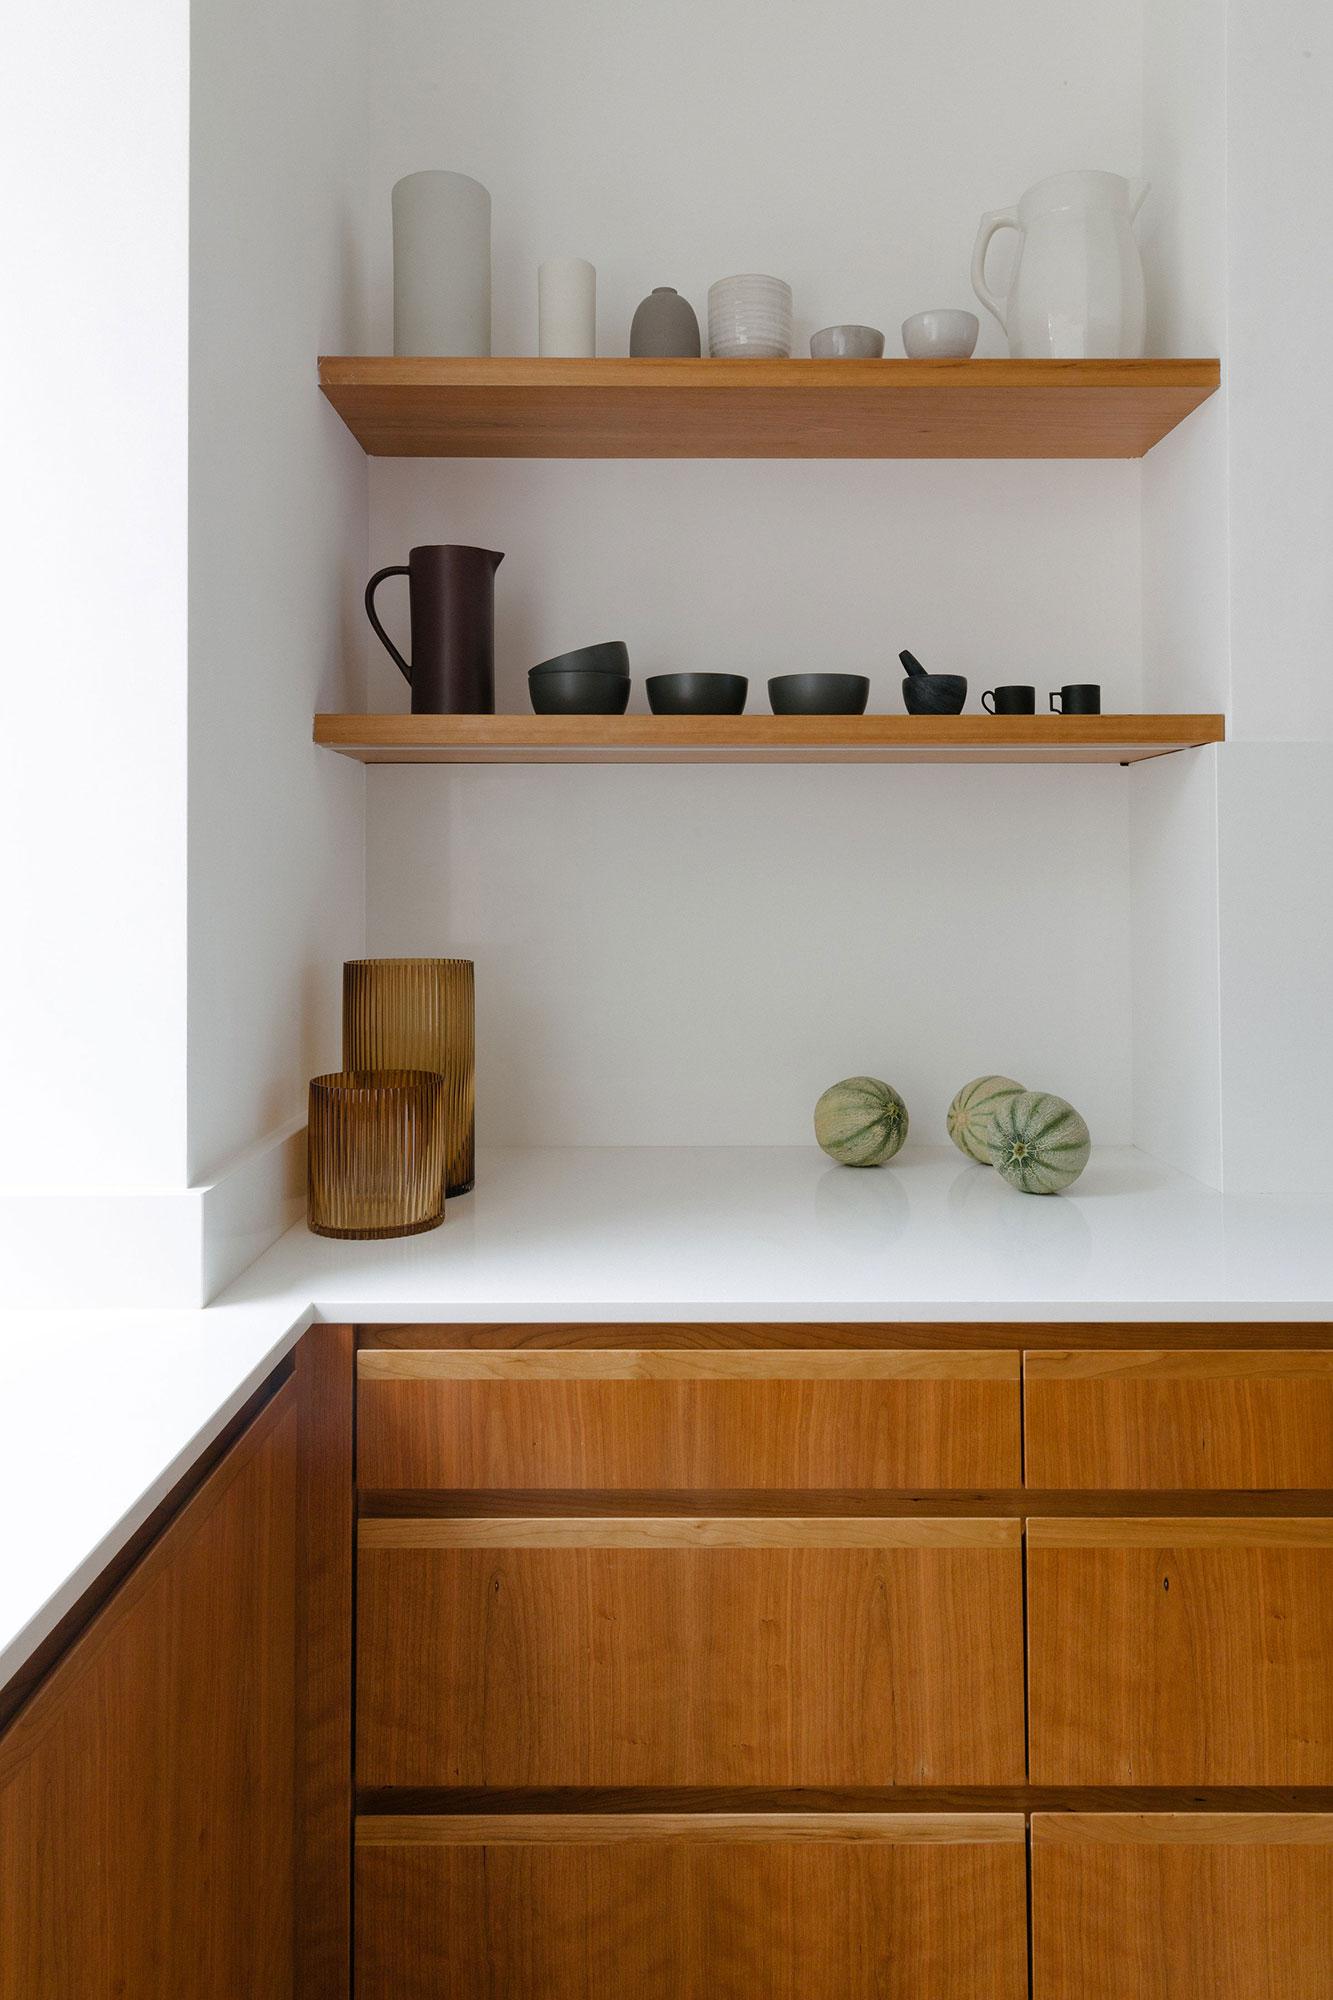 cherry veneer kitchen with shelves